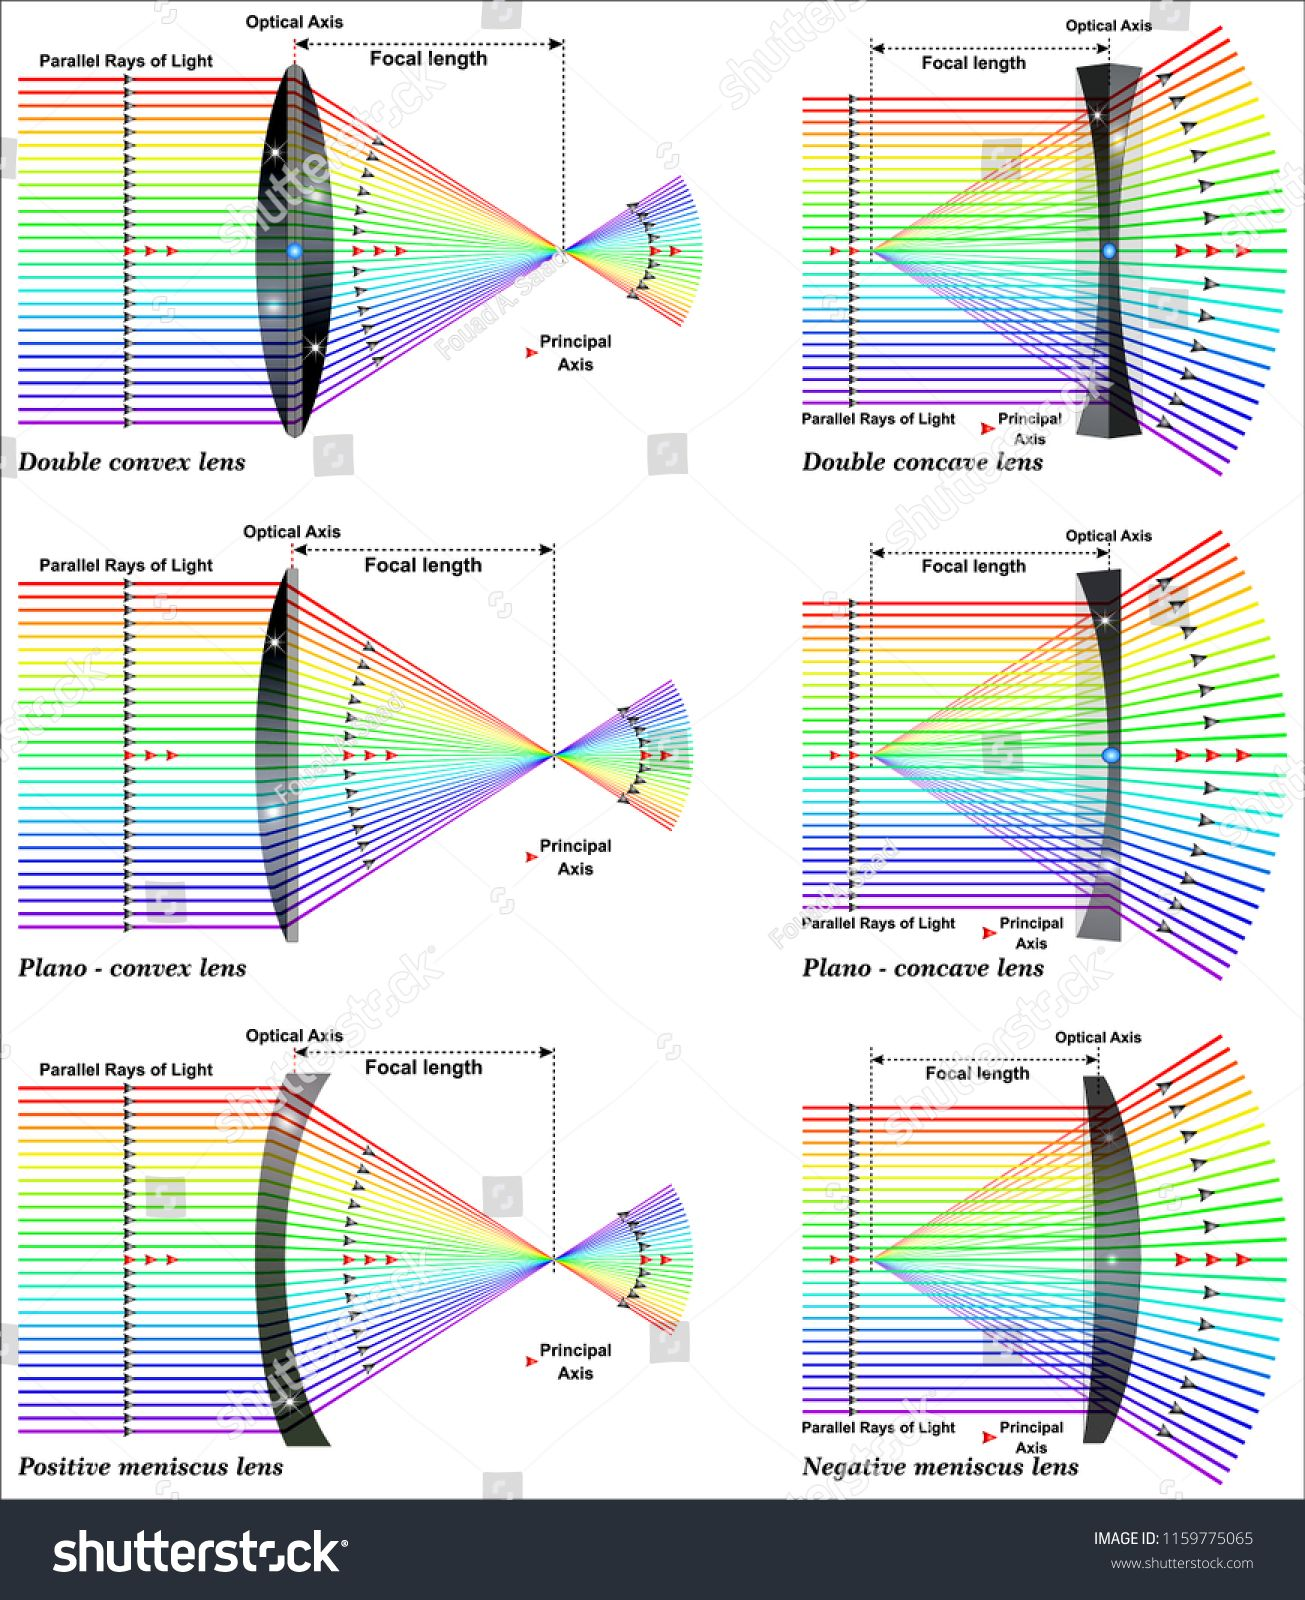 Ray Diagrams For Lenses N Sponsored Sponsored Ray Diagrams Lensesn In 2020 Diagram Vector Images Royalty Free Photos